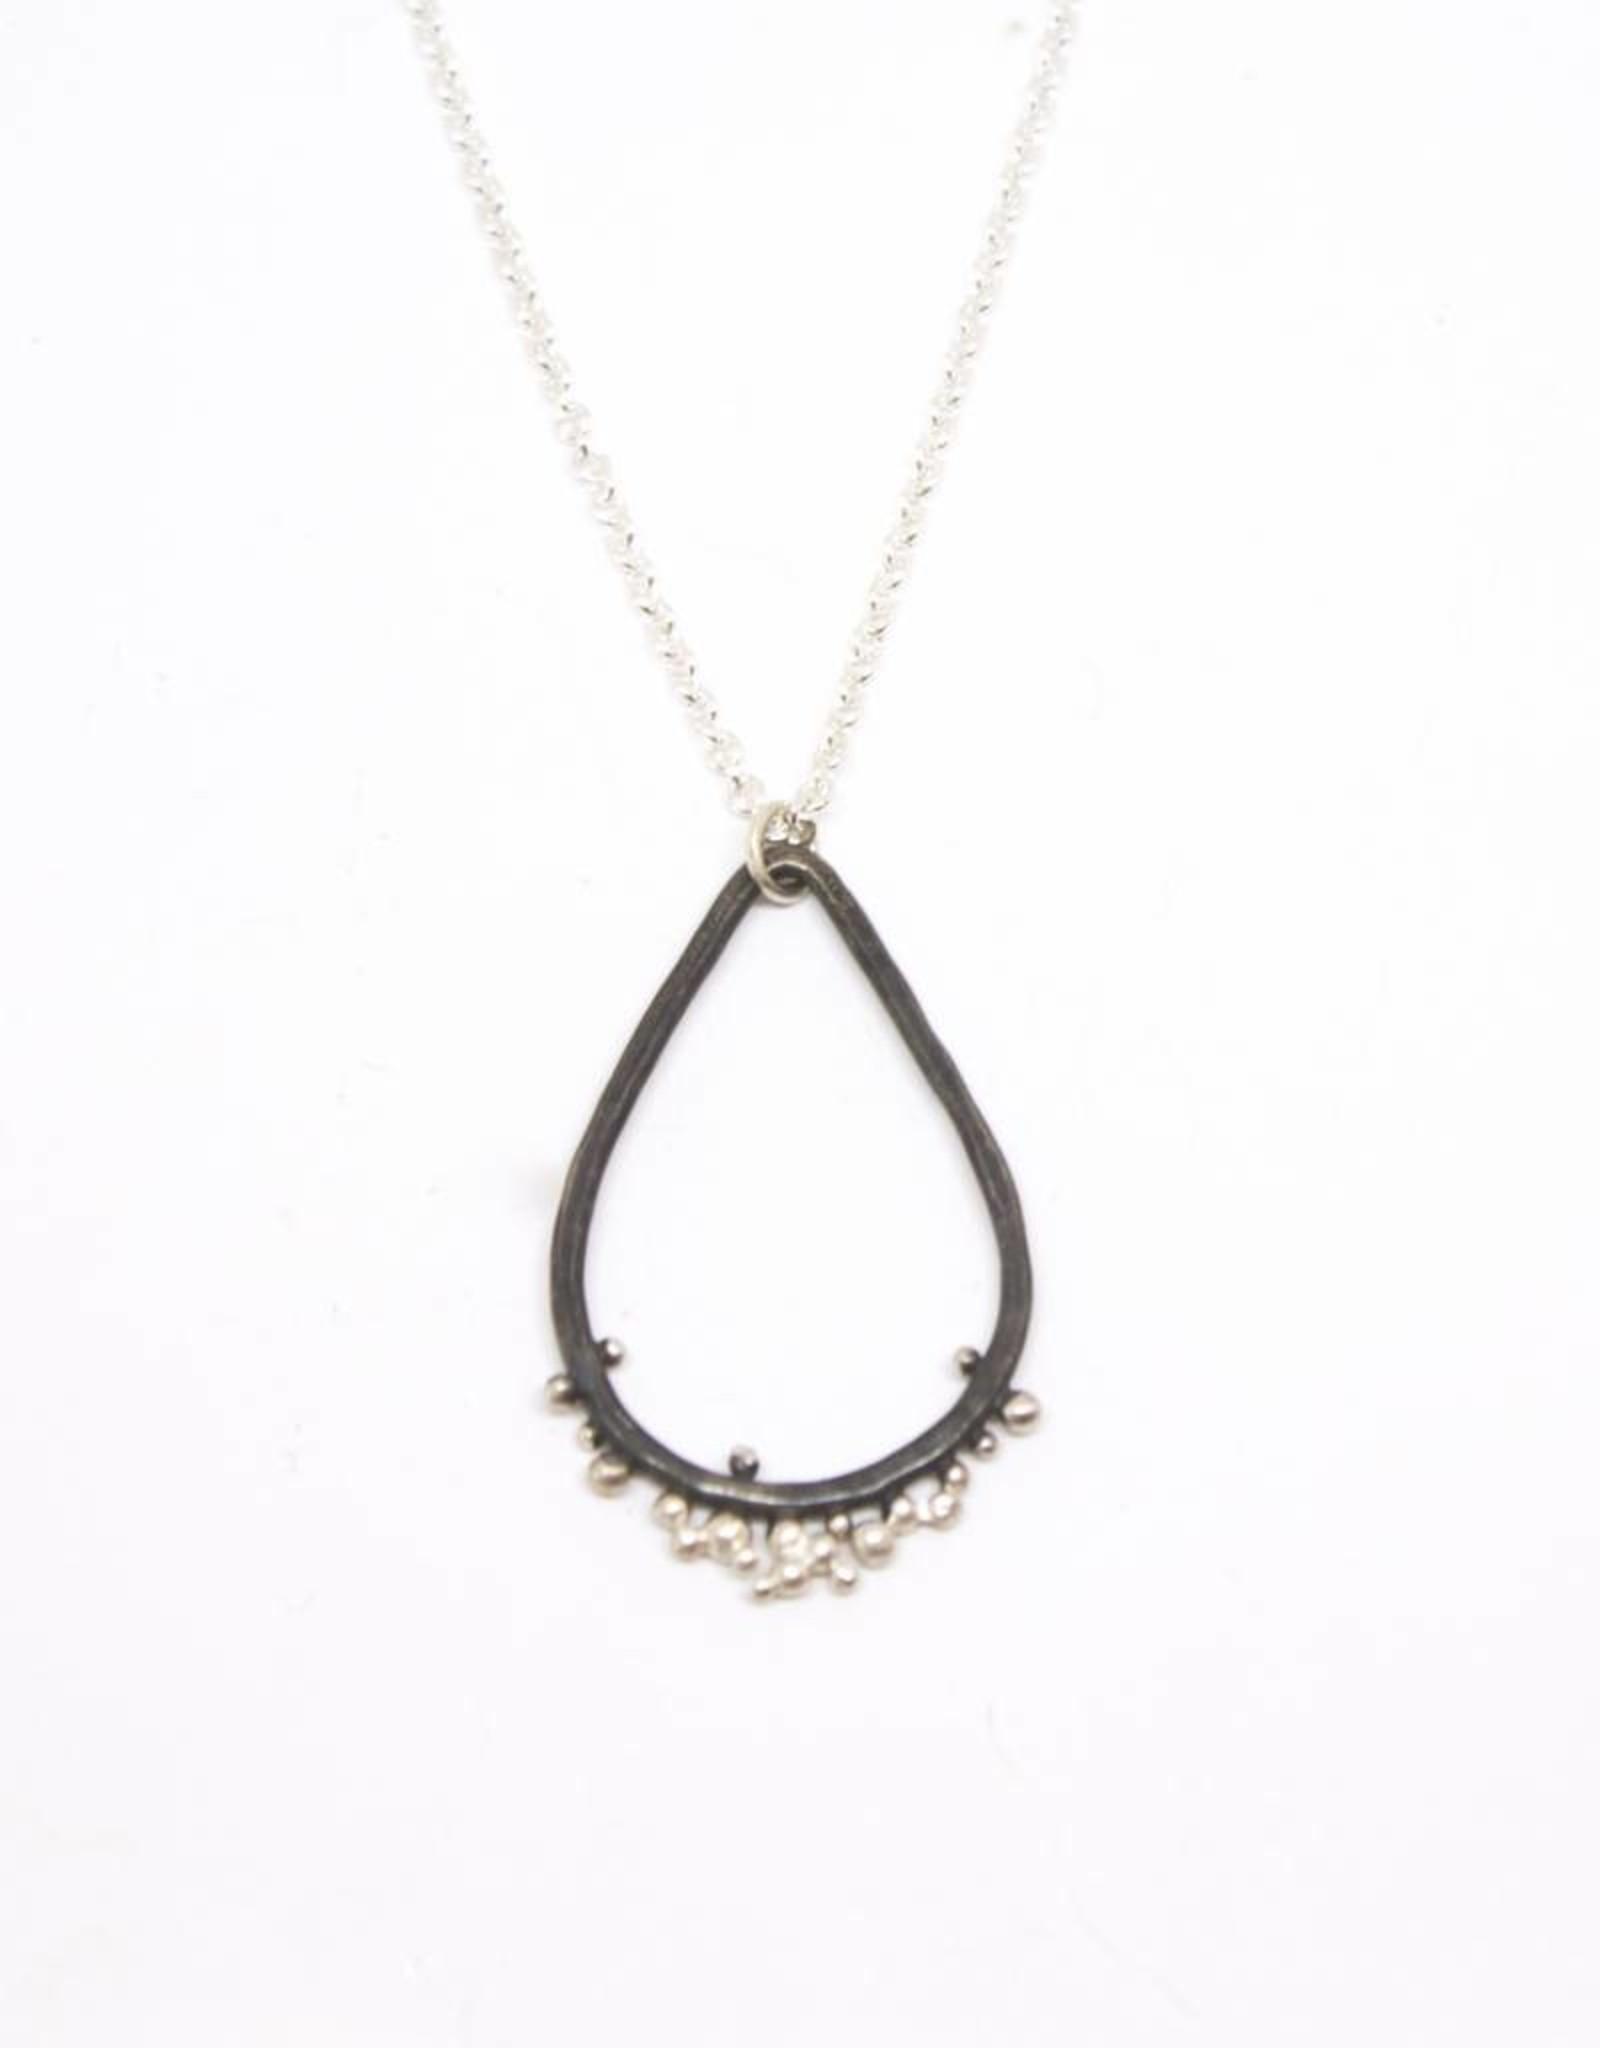 Sarah Swell Flotsam & Jetsam Teardrop Necklace